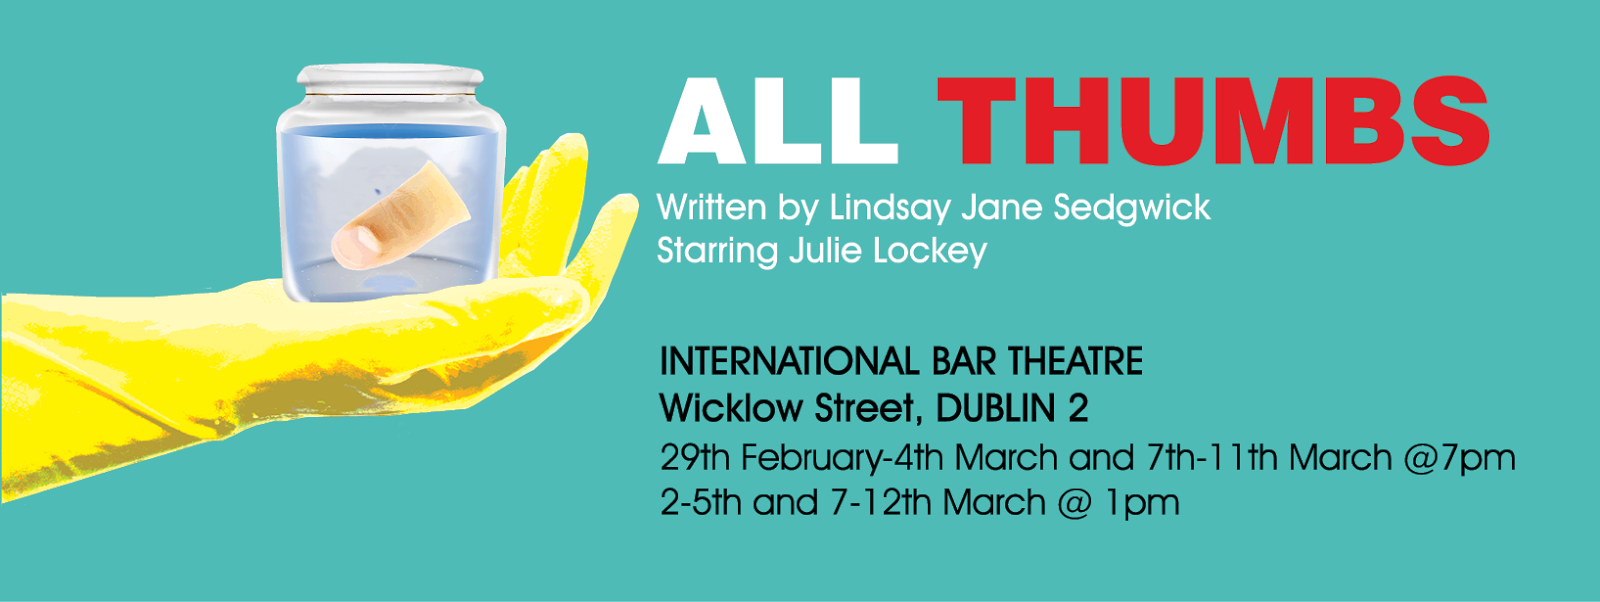 Opens Feb 29th in the International Bar, Dublin 2